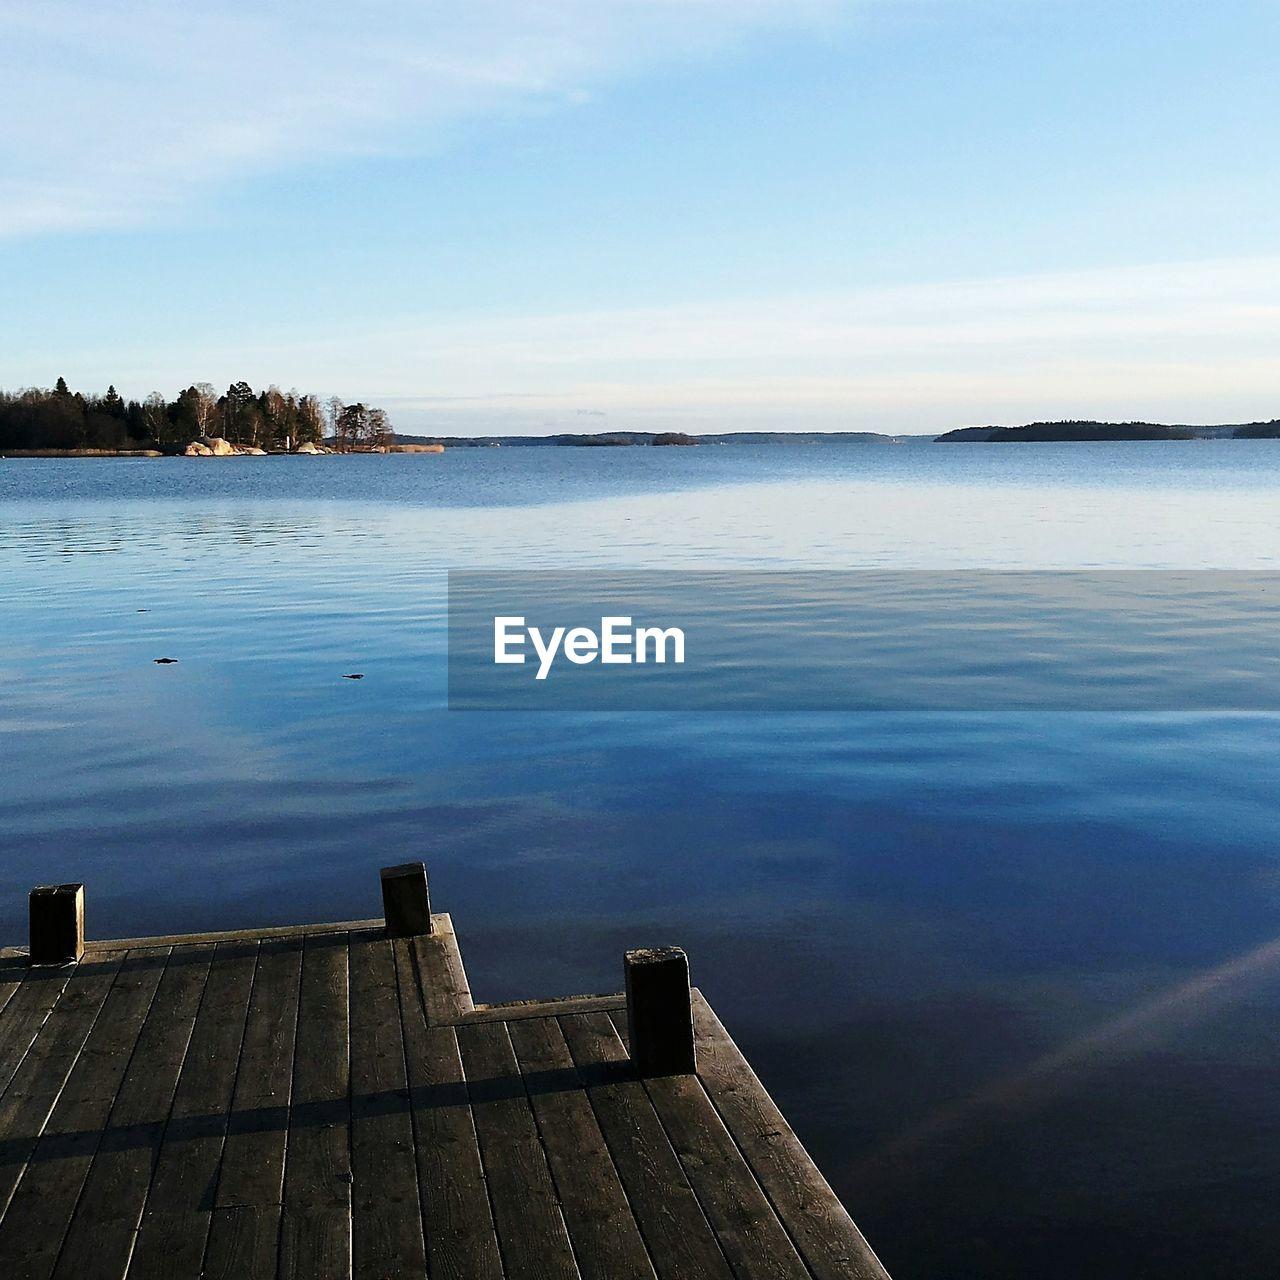 Photo taken in Åkersberga, Sweden